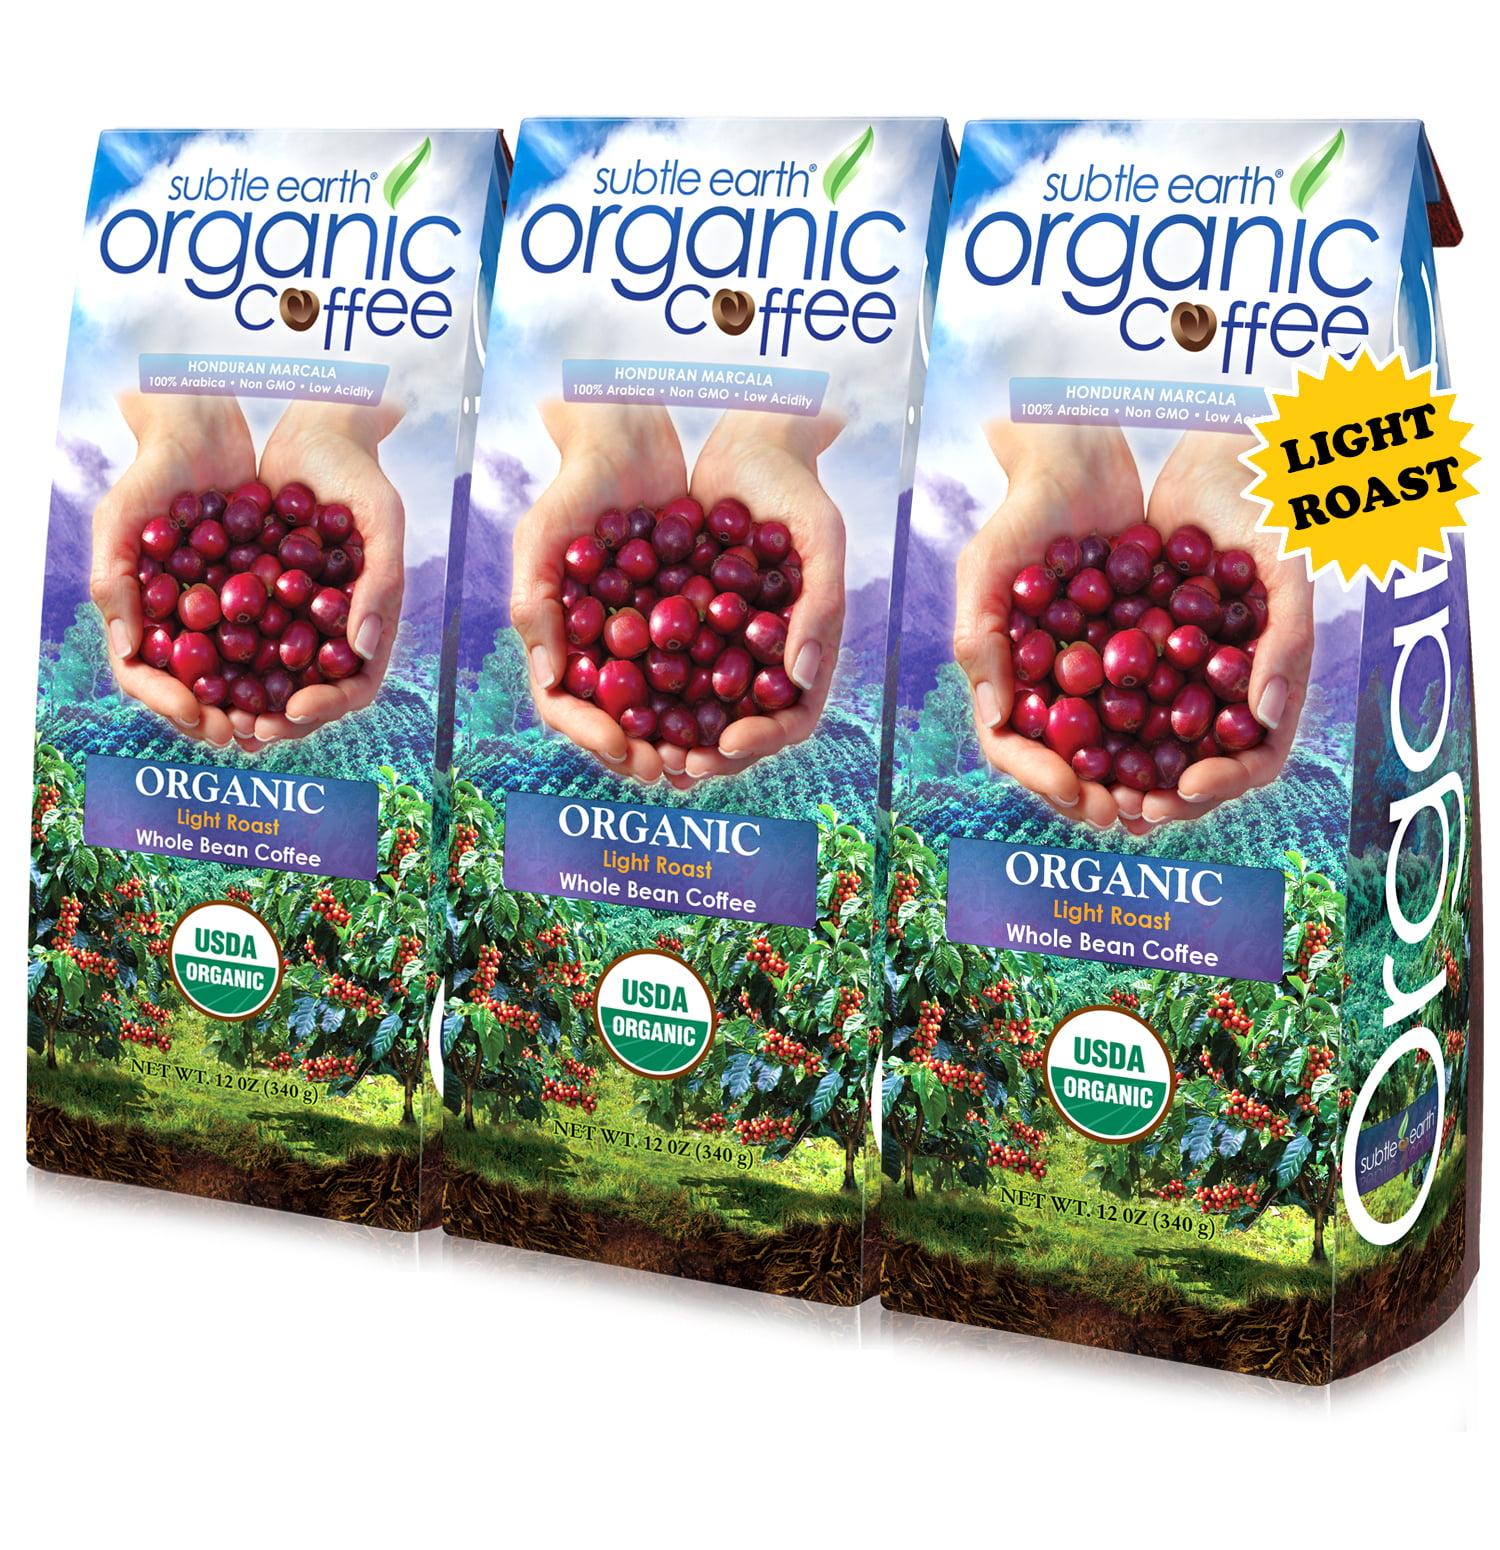 (3 Pack) Subtle Earth Organic Light Roast Whole Bean Coffee, 12 oz